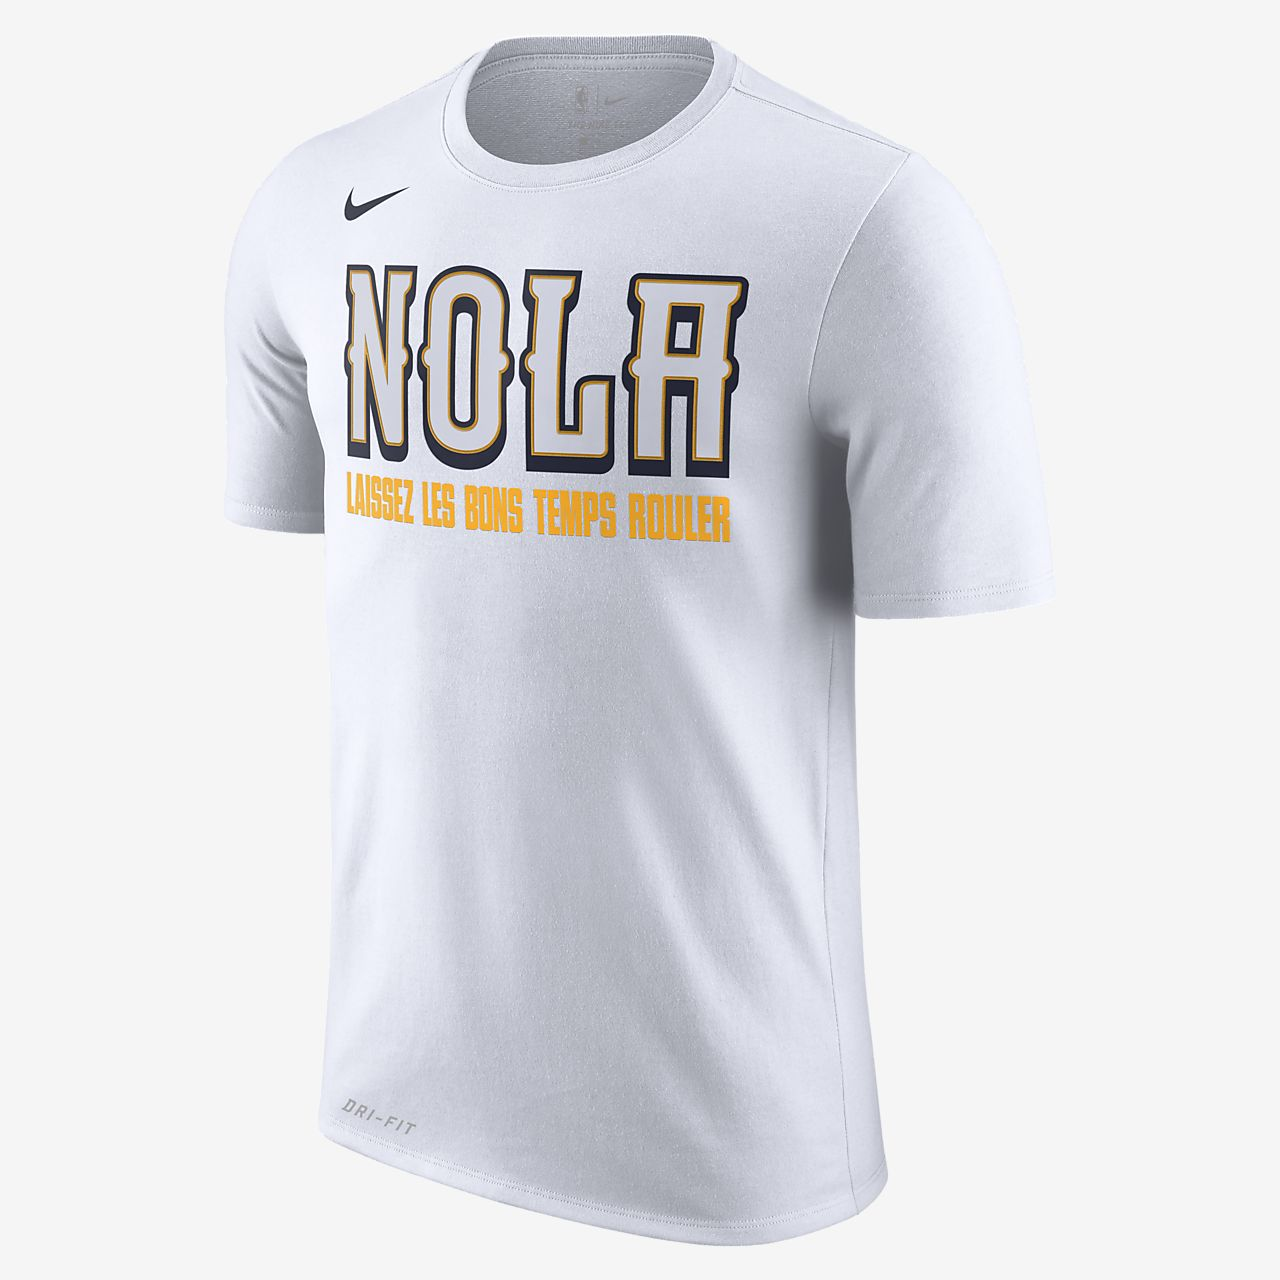 Tee-shirt NBA New Orleans Pelicans City Edition Nike Dri-FIT pour Homme